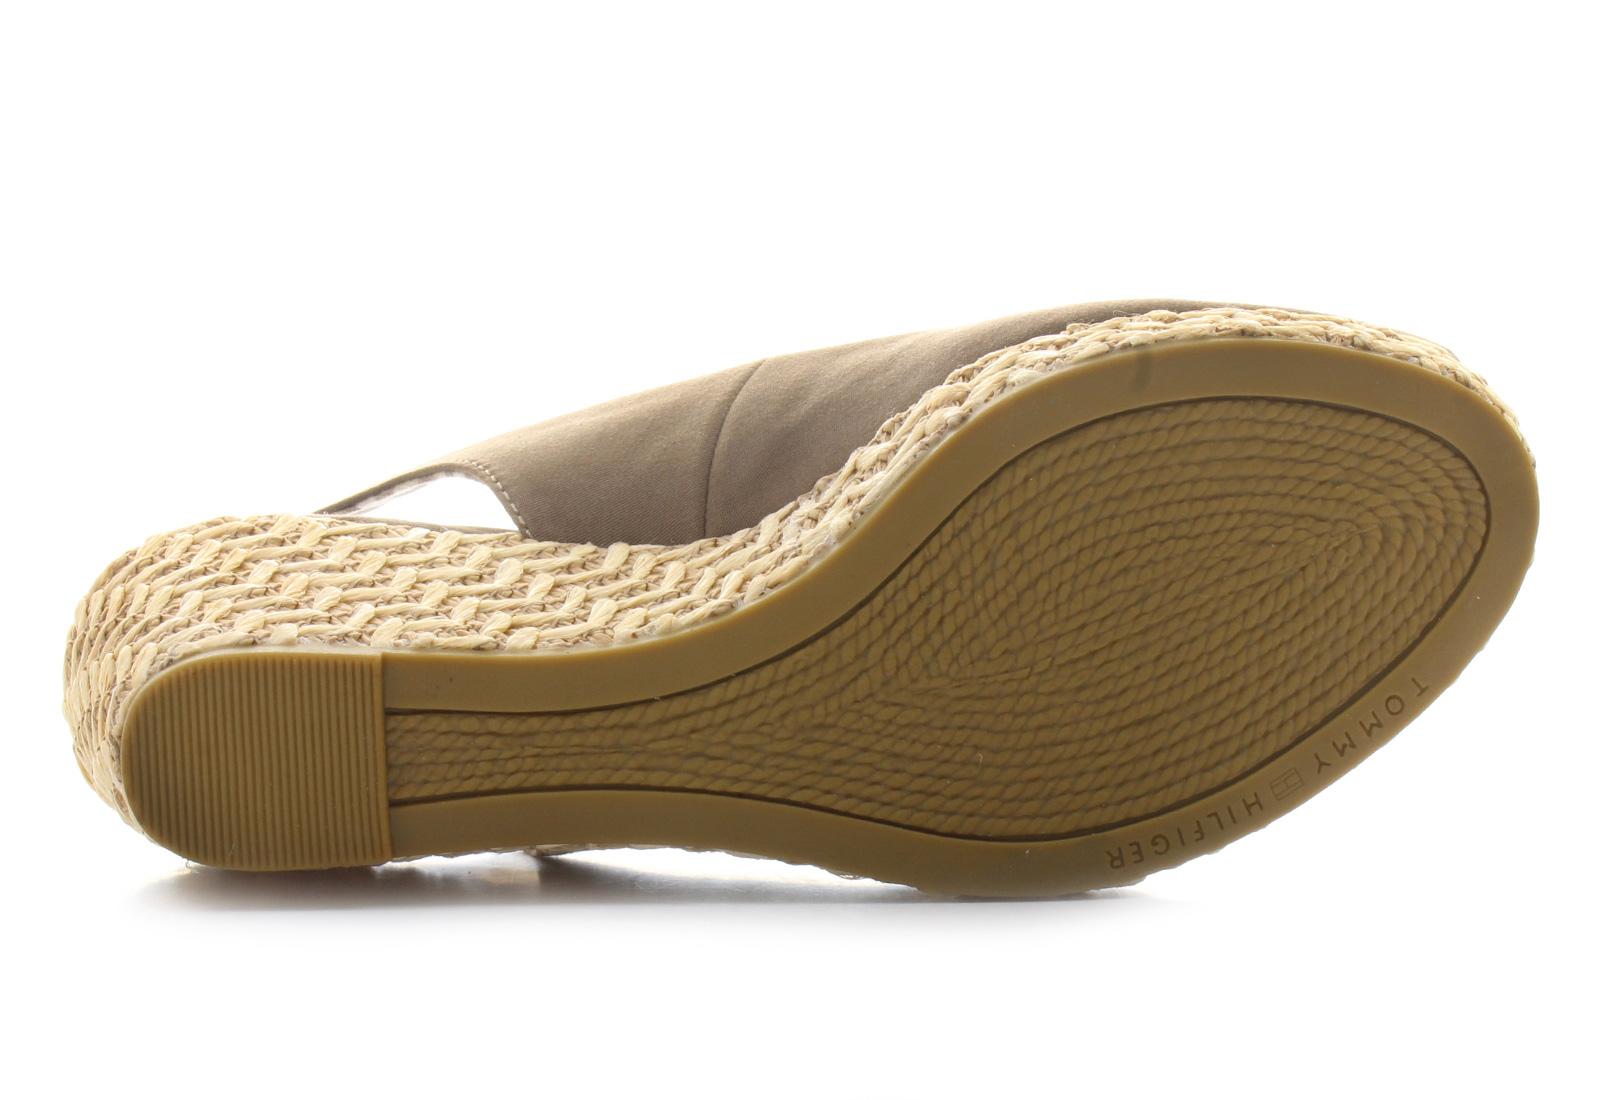 60f97bb6982a Tommy Hilfiger Platforma Sive Sandale - Elba 17d - Office Shoes ...